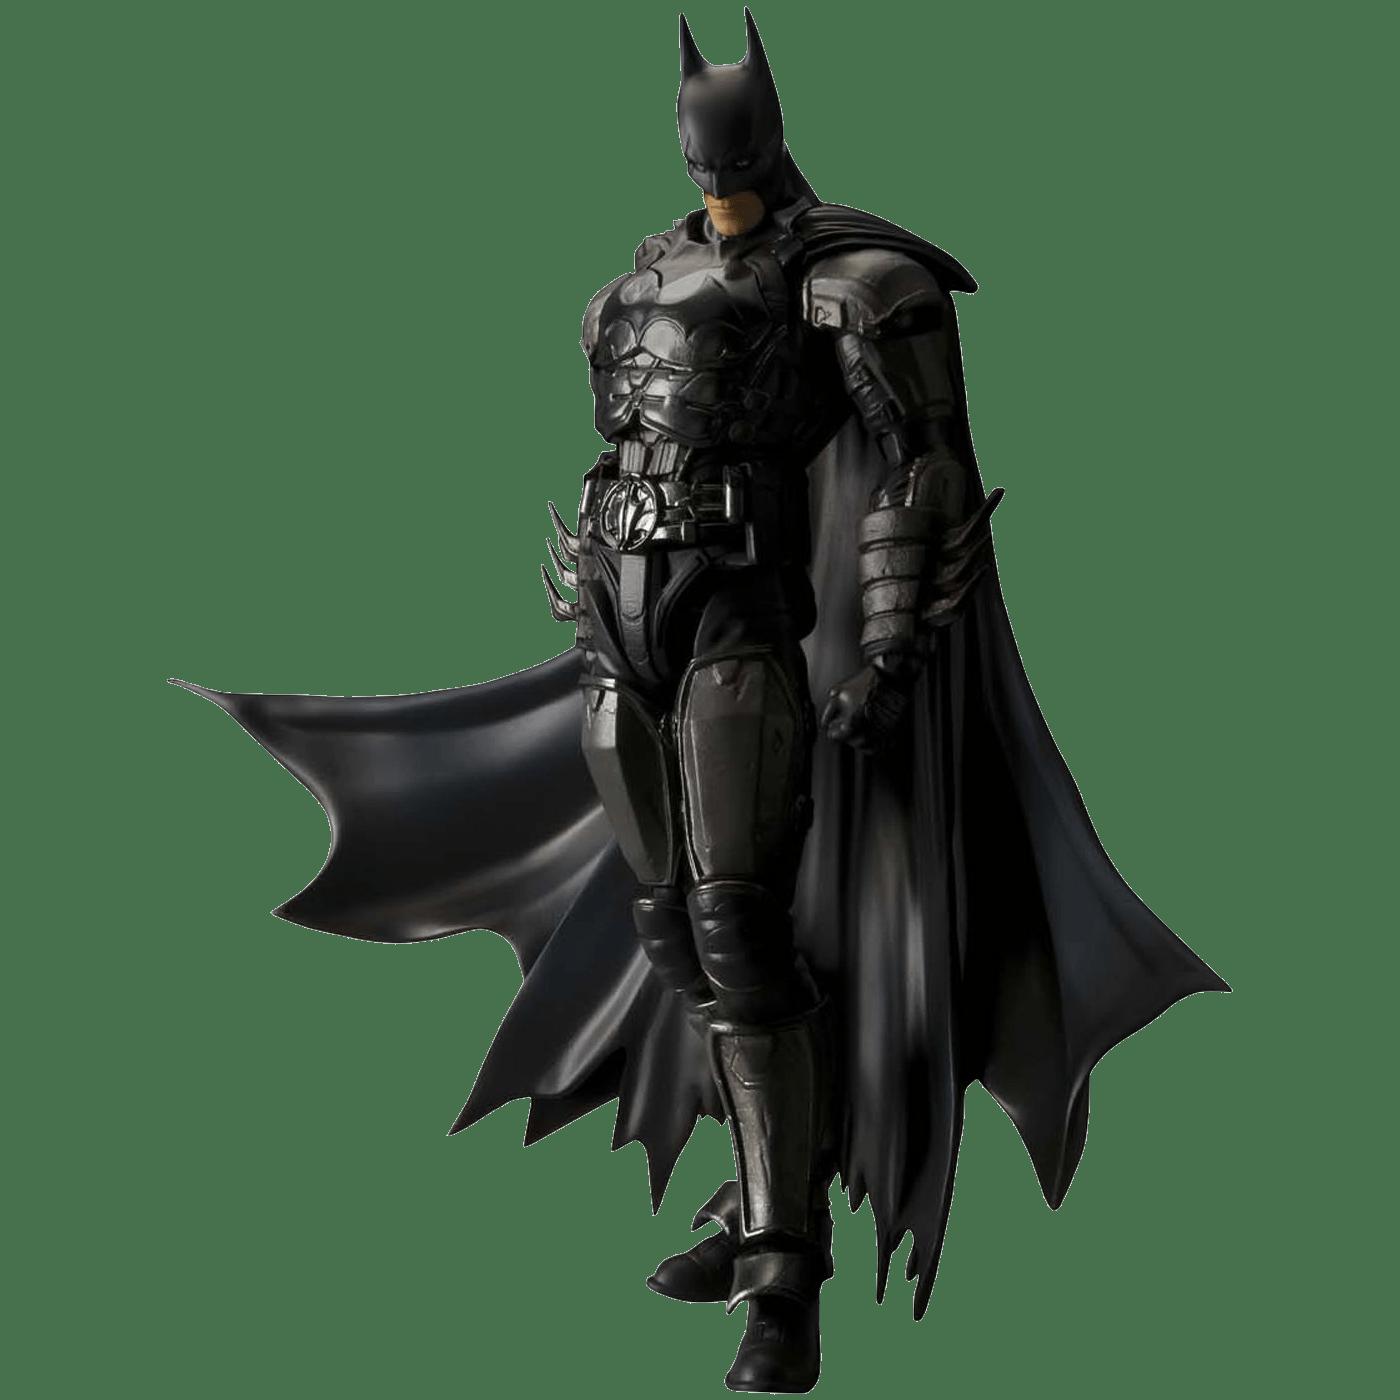 Batman Transparent Gallery